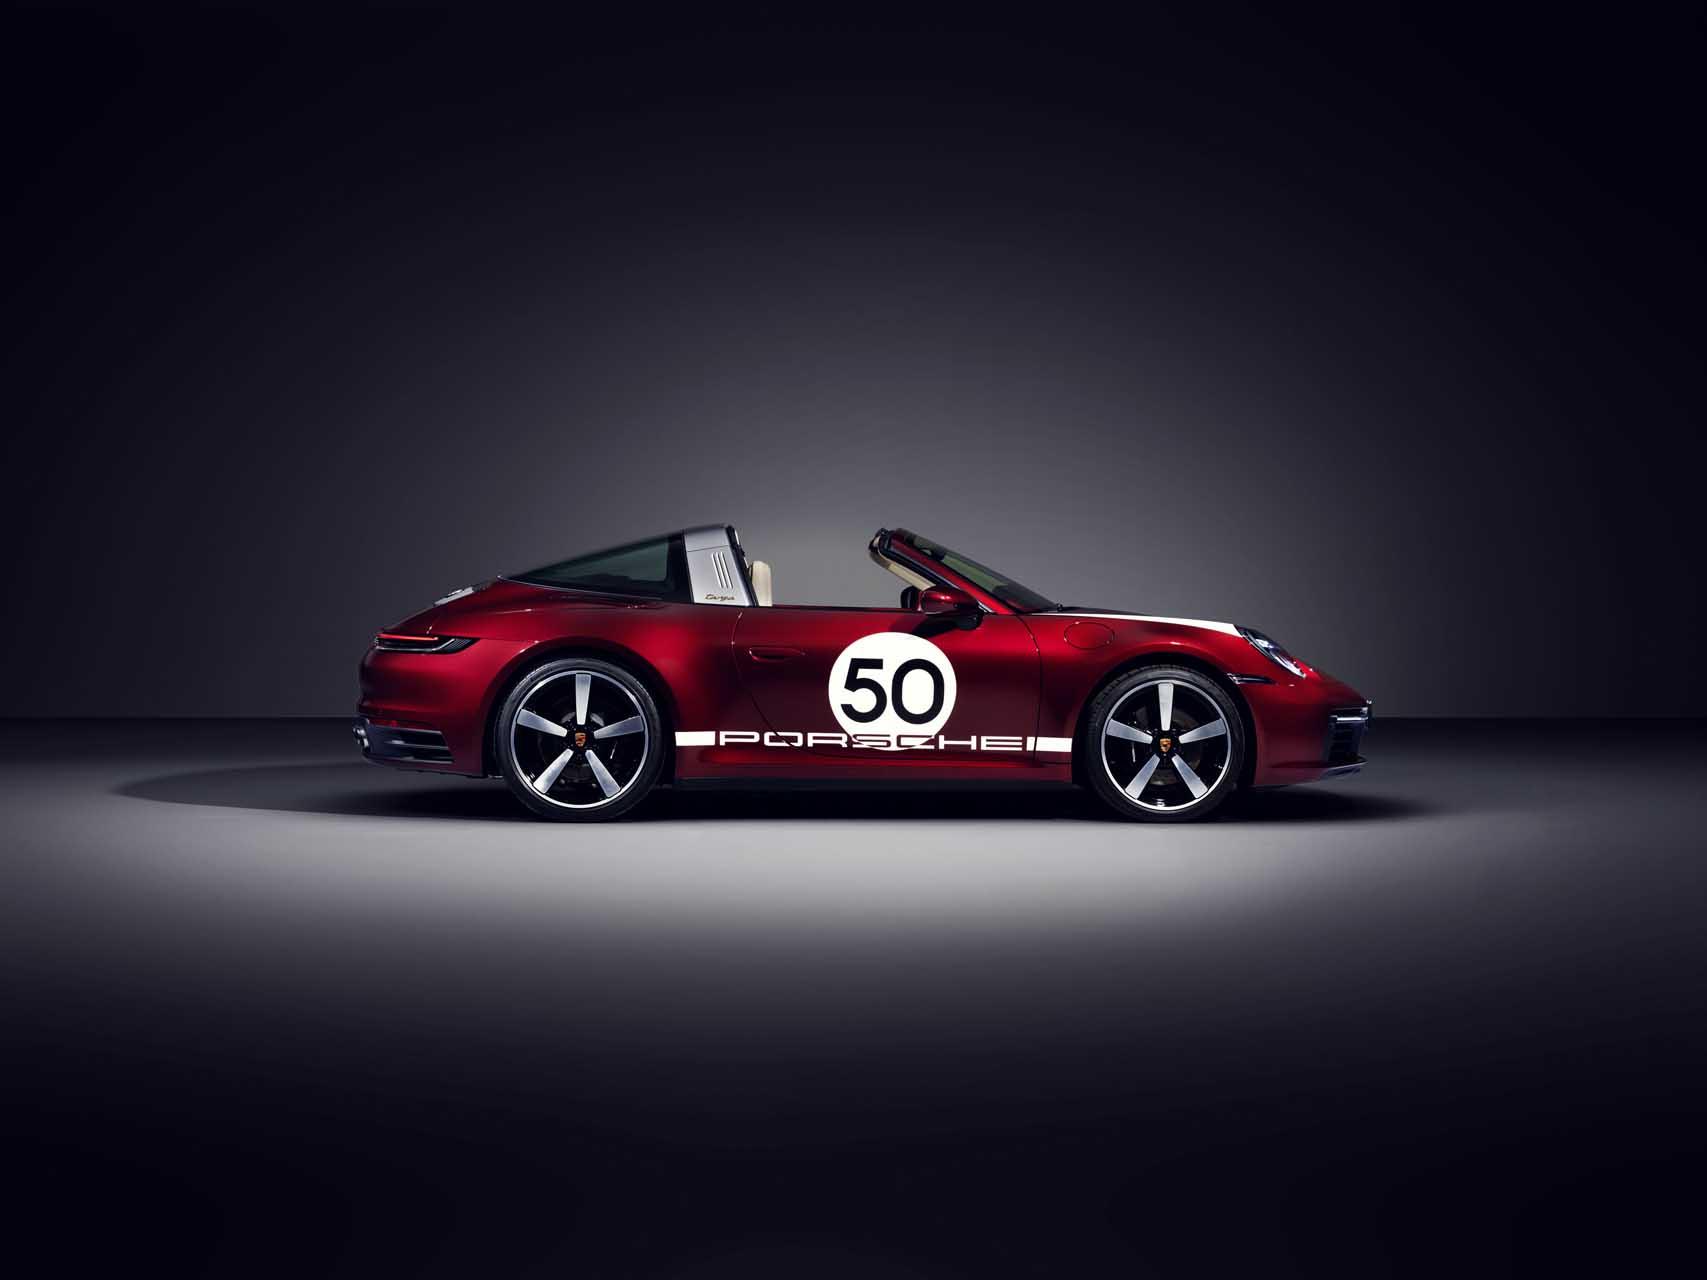 2021 Porsche 911 Targa 4s Heritage Design Has Throwback Looks Extremely Modern Price